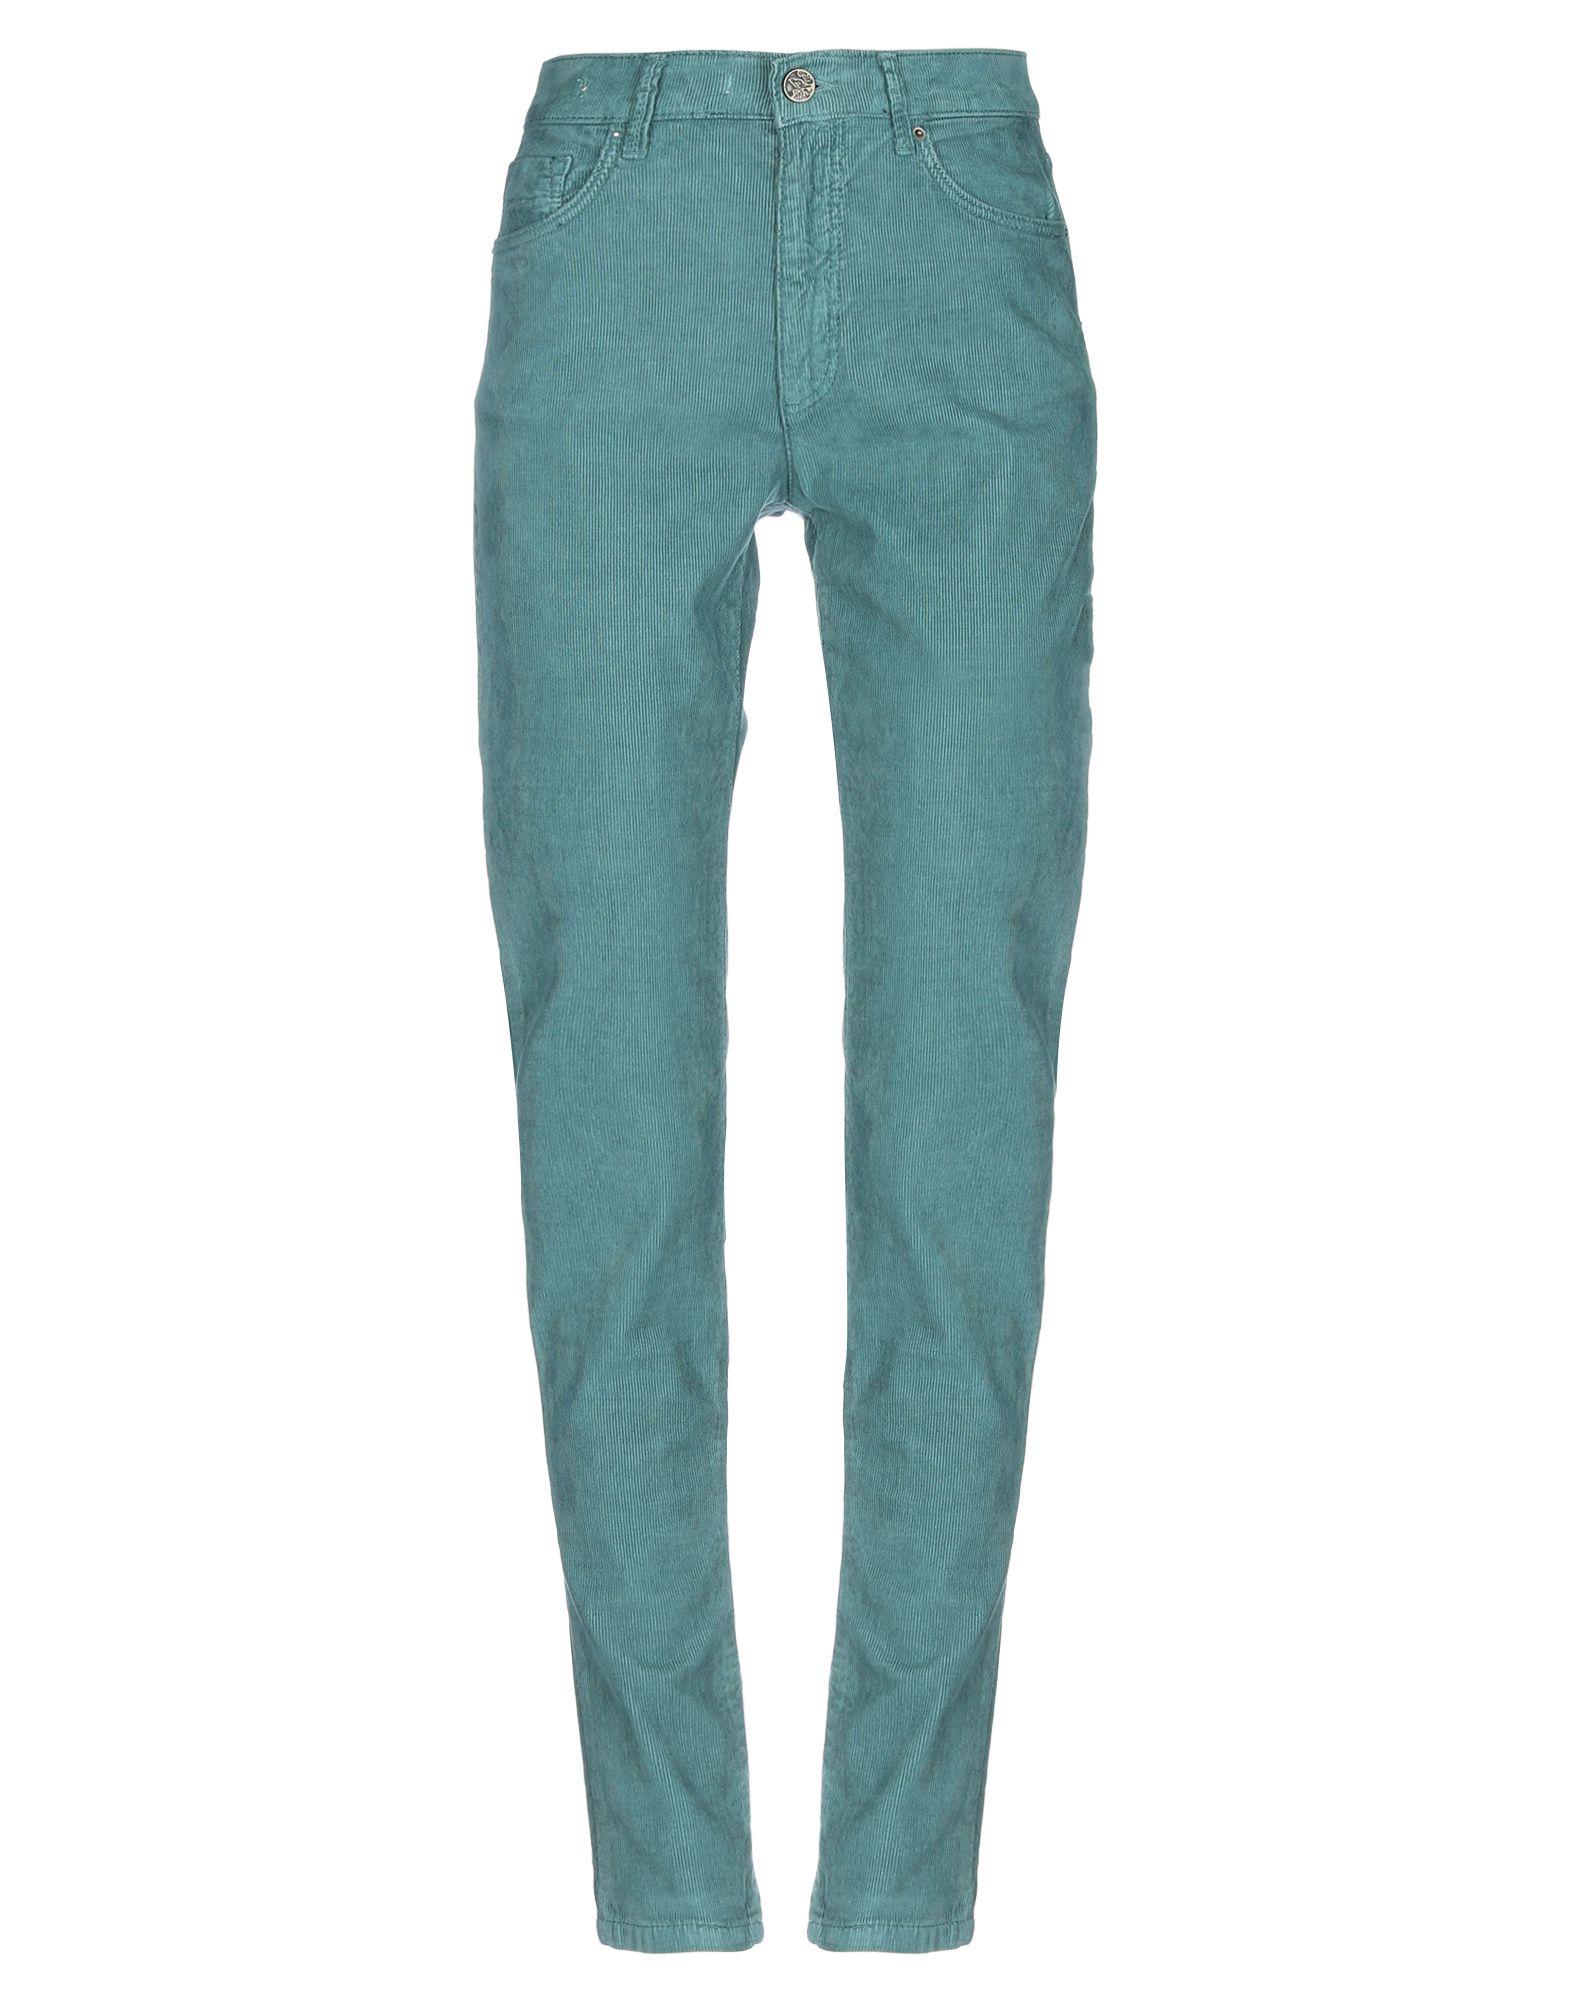 NICE THINGS by PALOMA S. Повседневные брюки nice things by paloma s повседневные брюки